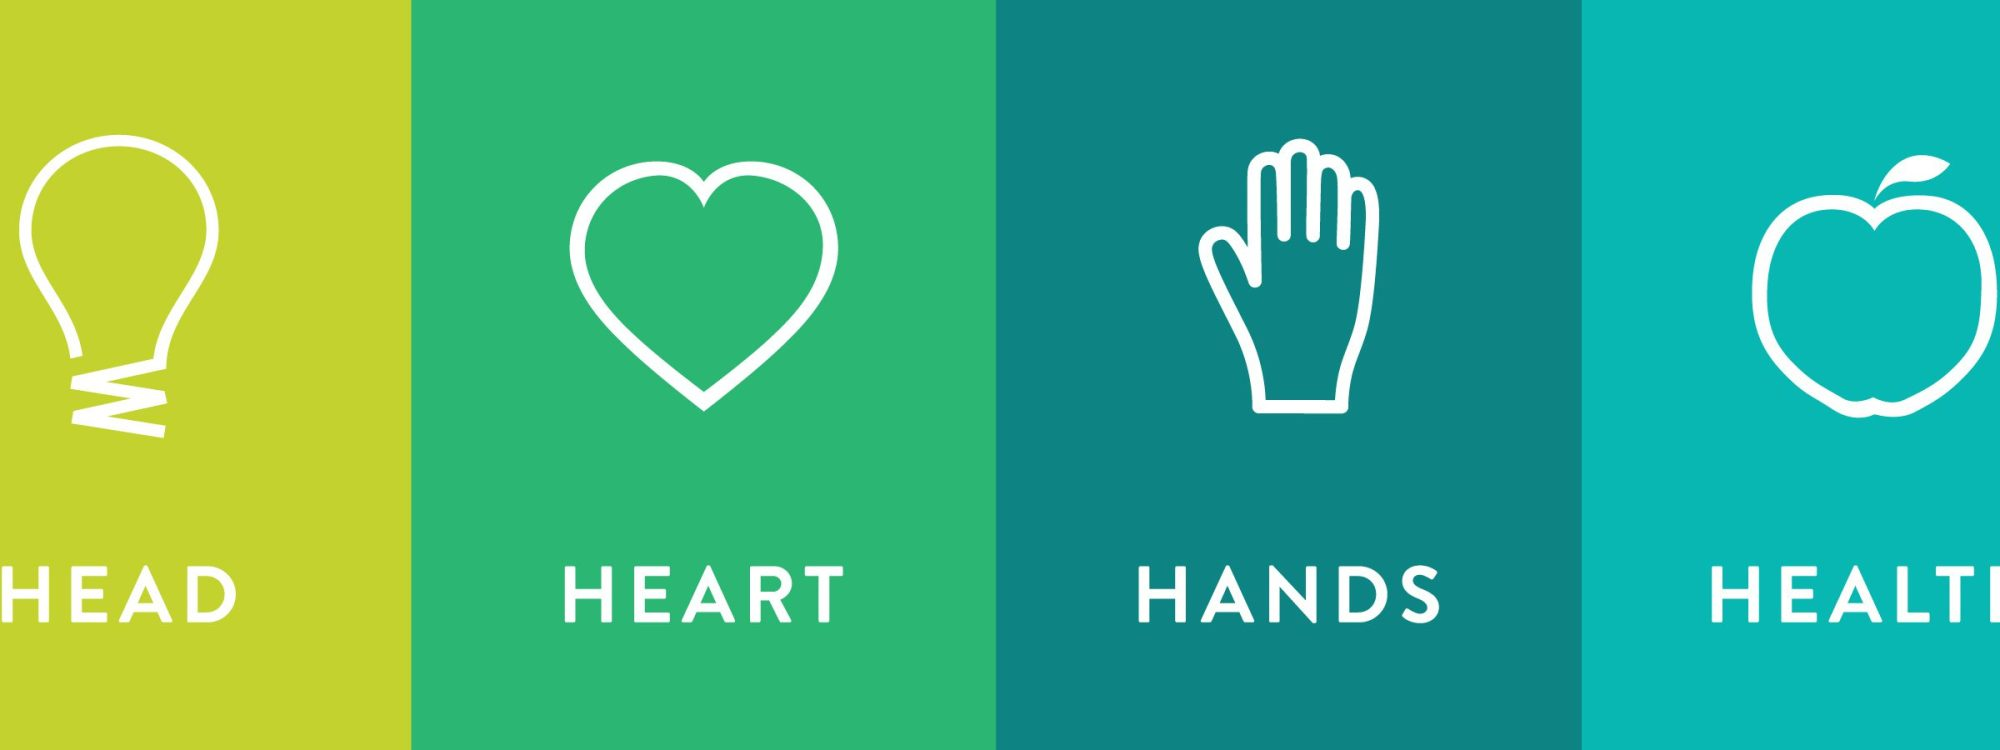 hight resolution of head heart hands health banner